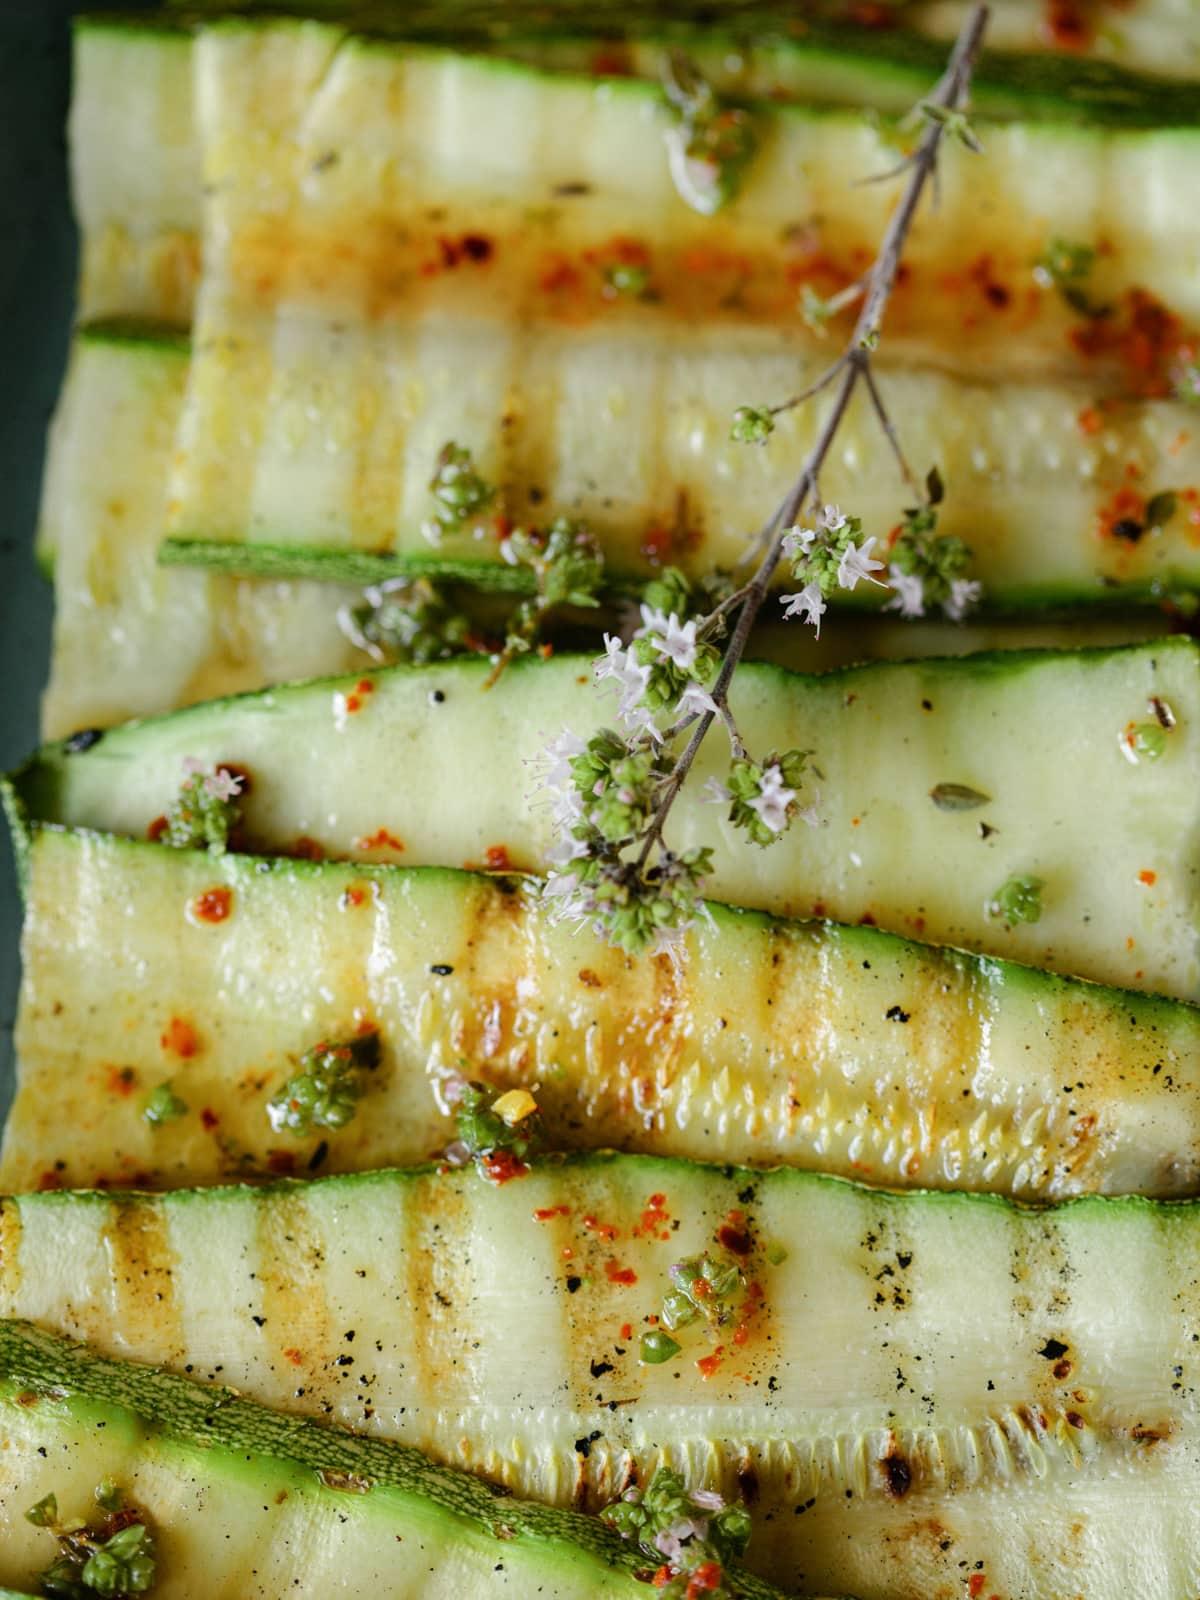 Zucchini-mariniert-Sterneacker-(11)